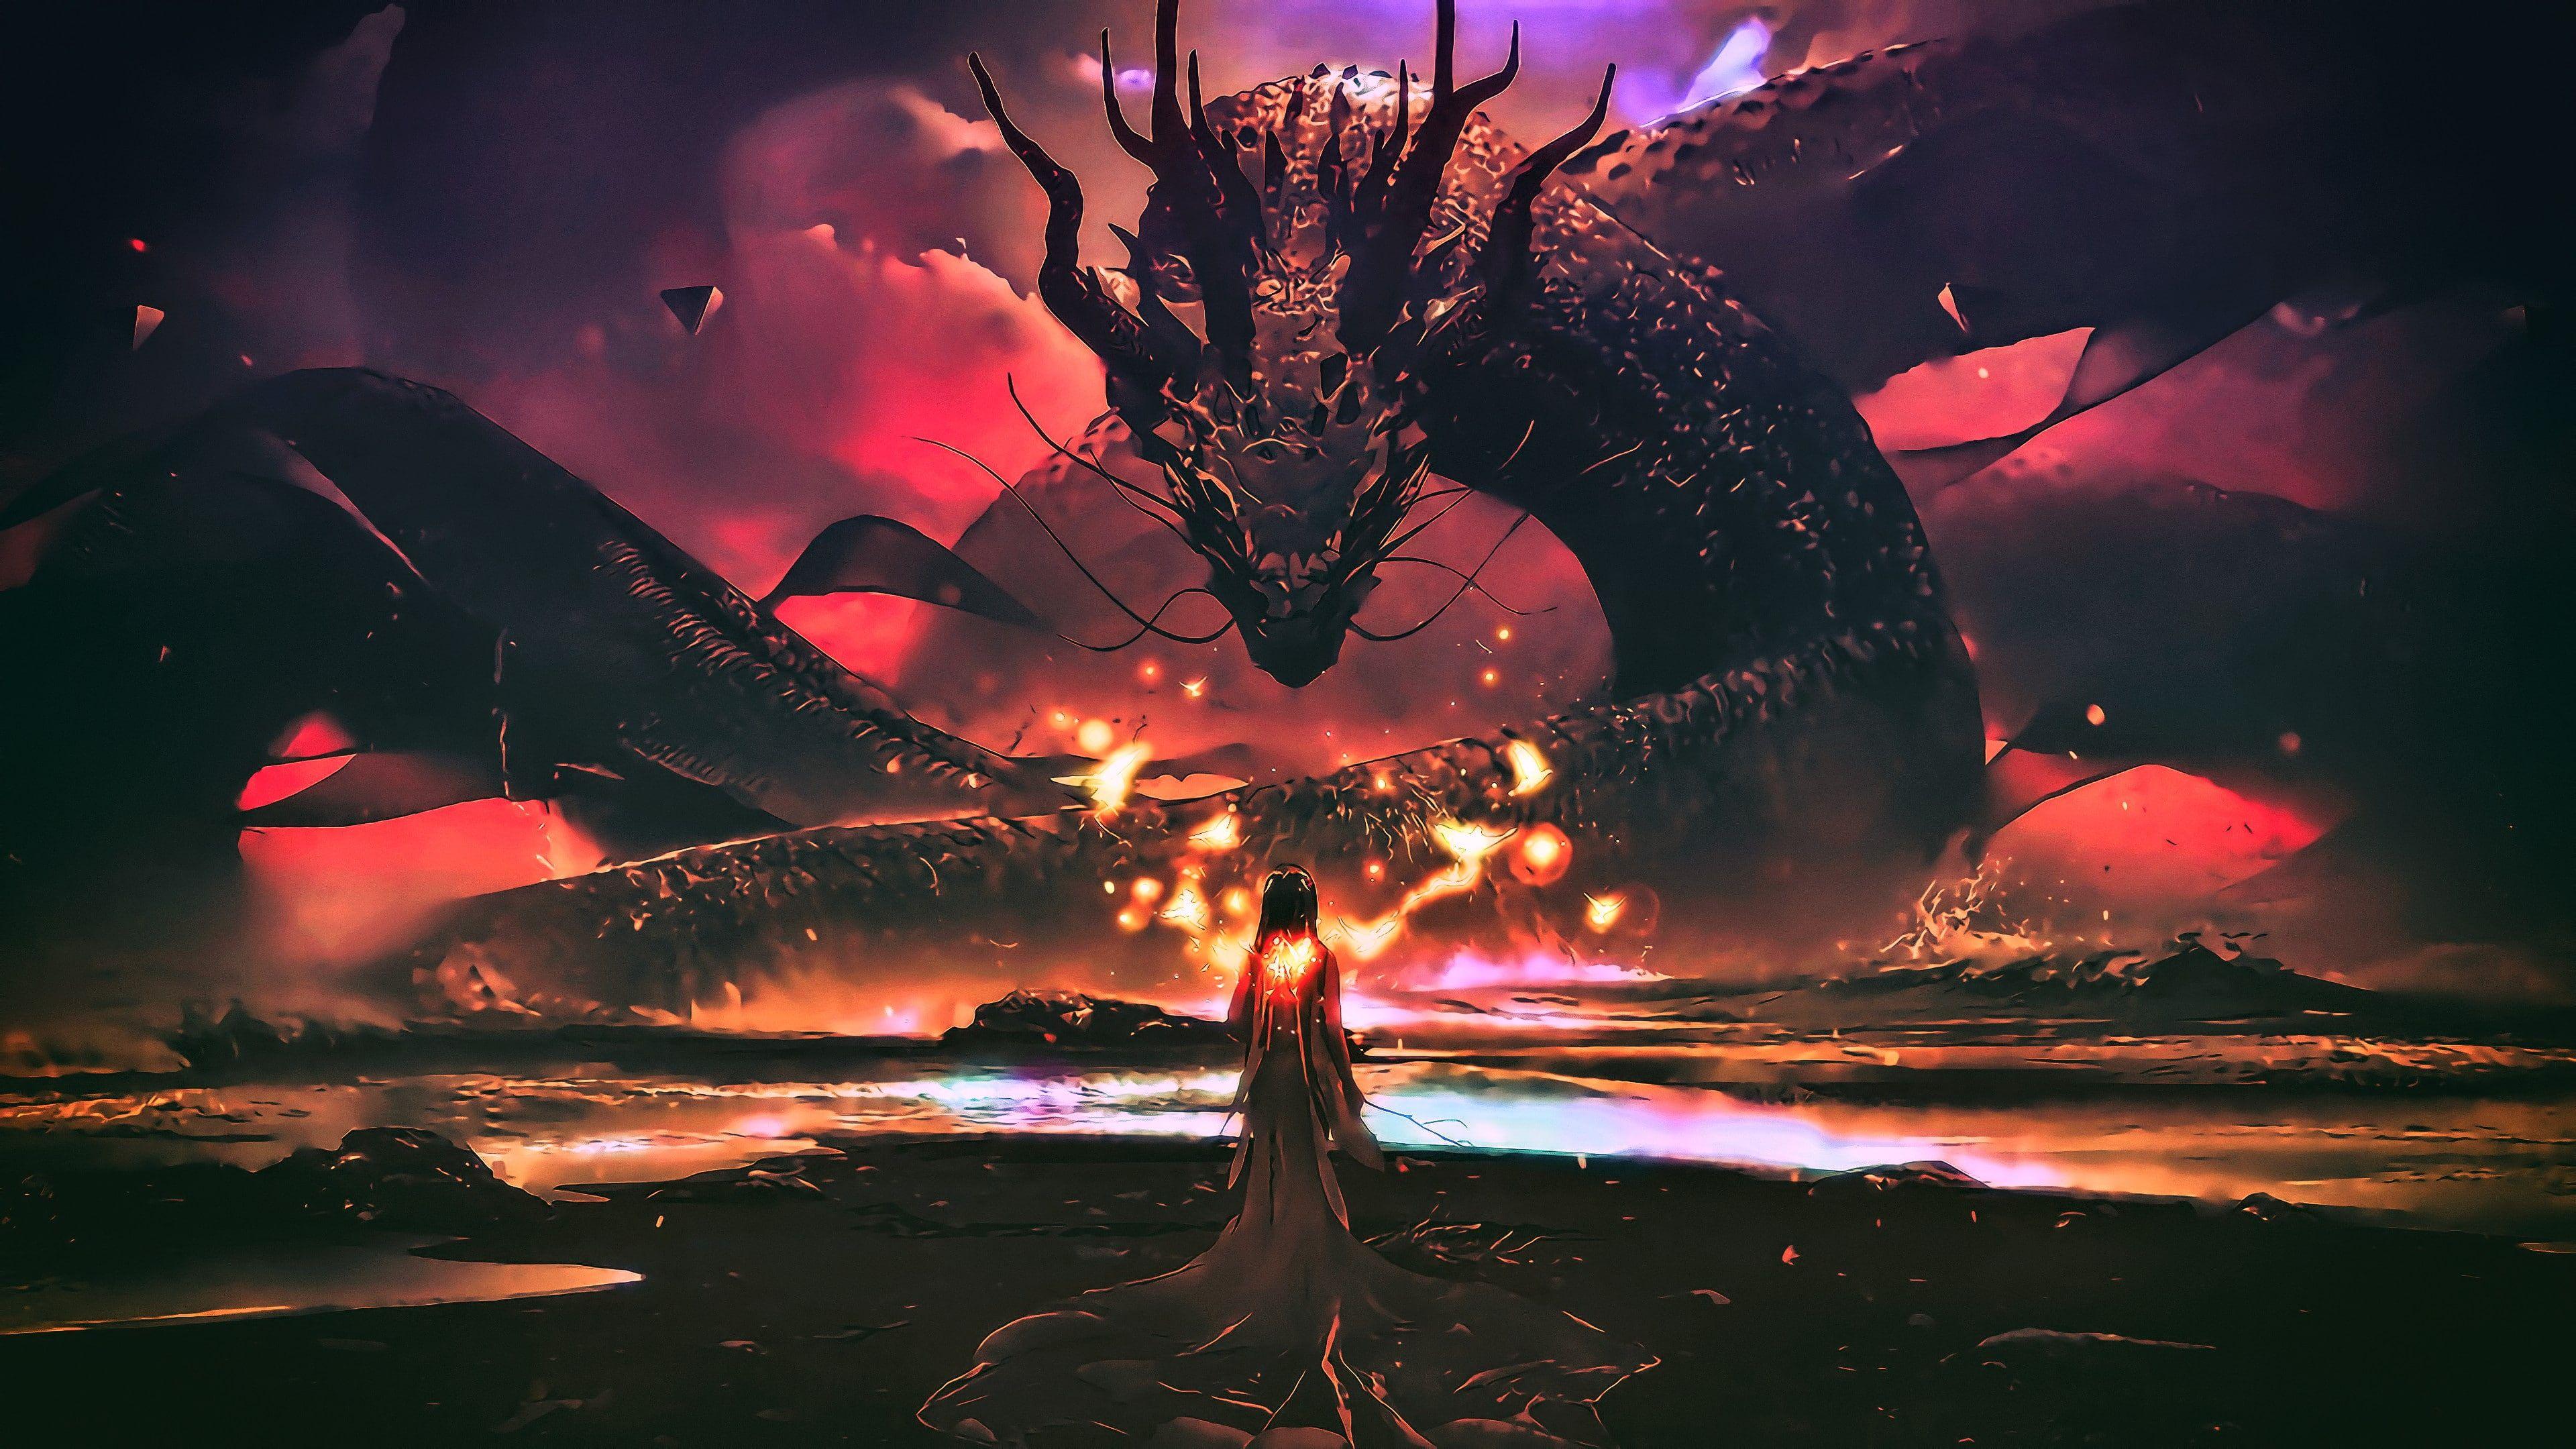 Dragon Darkness Digital Art Sky Woman Dragon Art Heat Art Artwork Fantasy Art Imagination 4k Wa 3840x2160 Wallpaper Goddess Artwork Digital Wallpaper